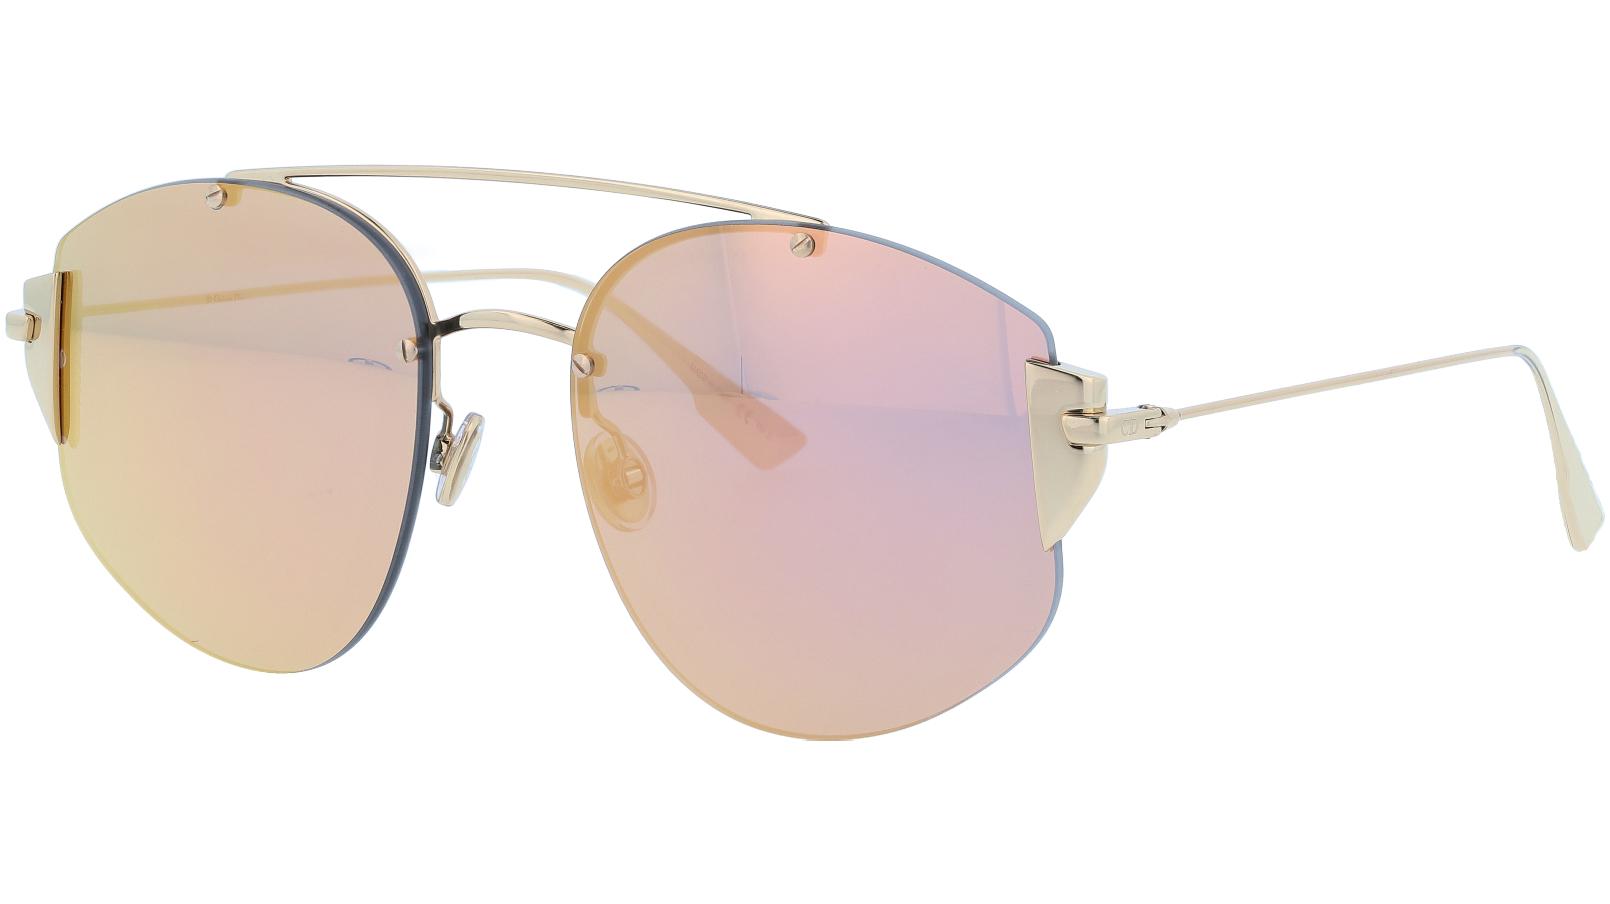 Dior STRONGER 000NE 58 Gold Sunglasses